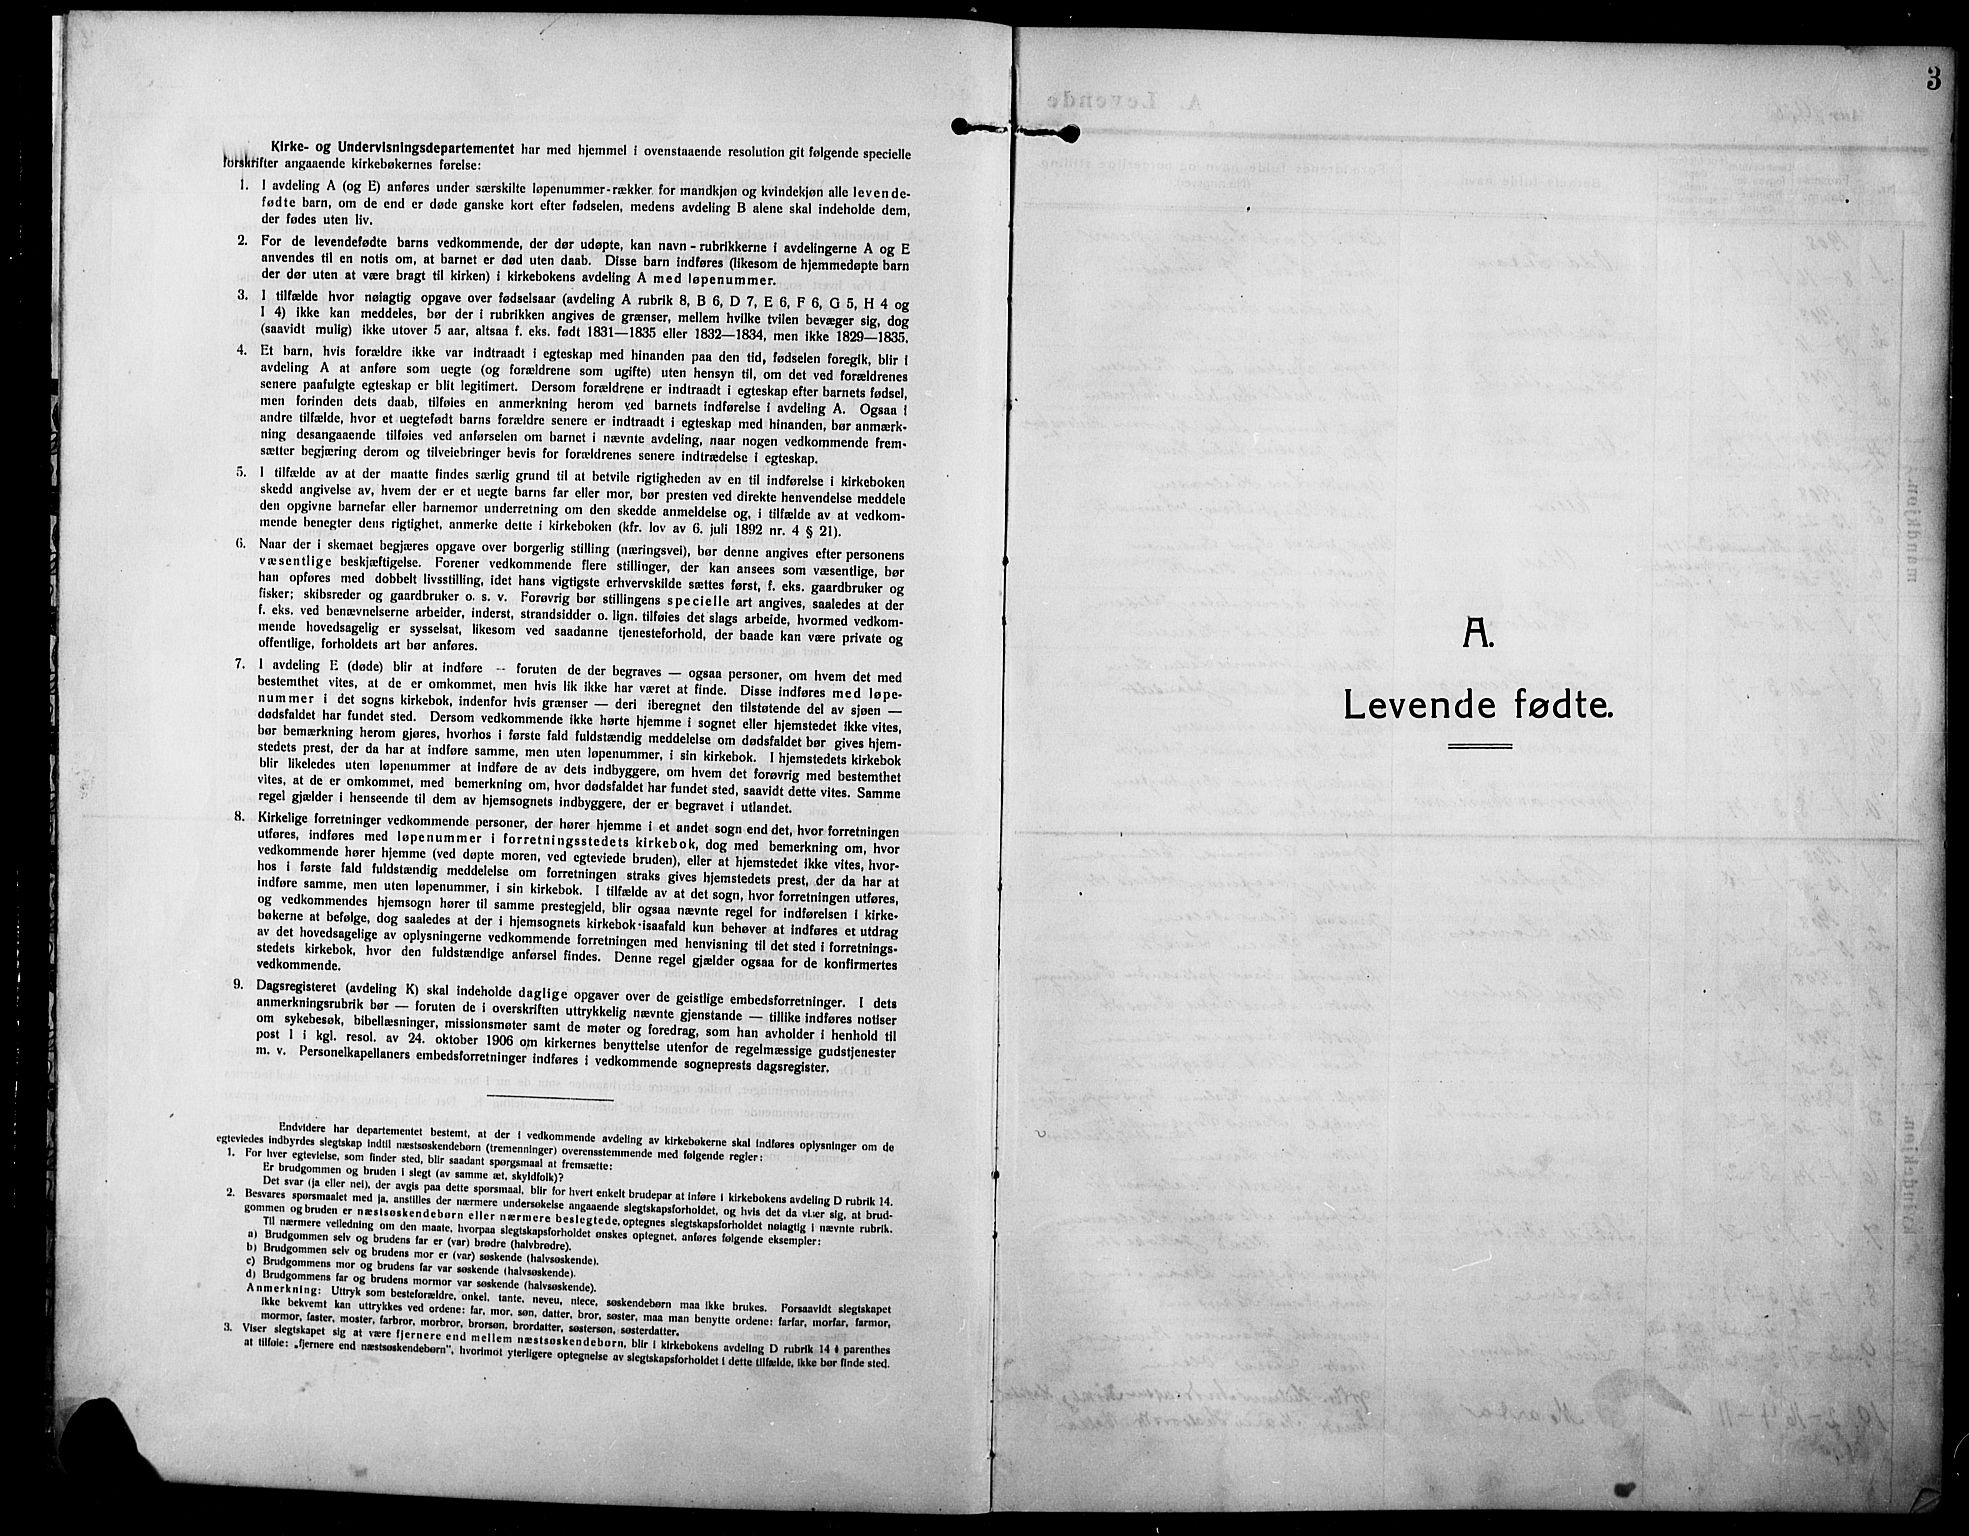 SAH, Lunner prestekontor, H/Ha/Hab/L0001: Klokkerbok nr. 1, 1909-1922, s. 3